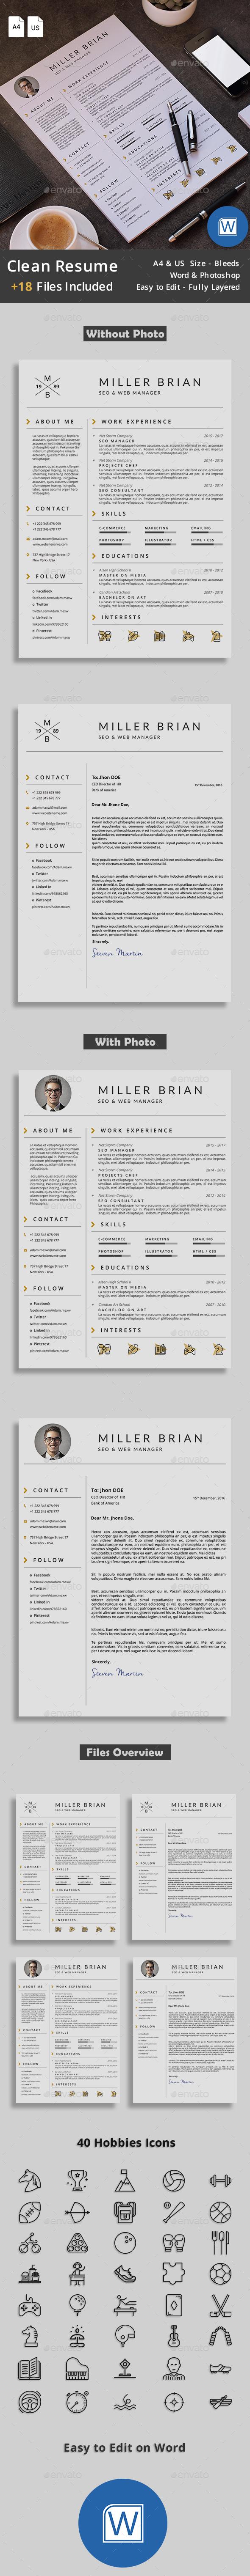 clean resume format